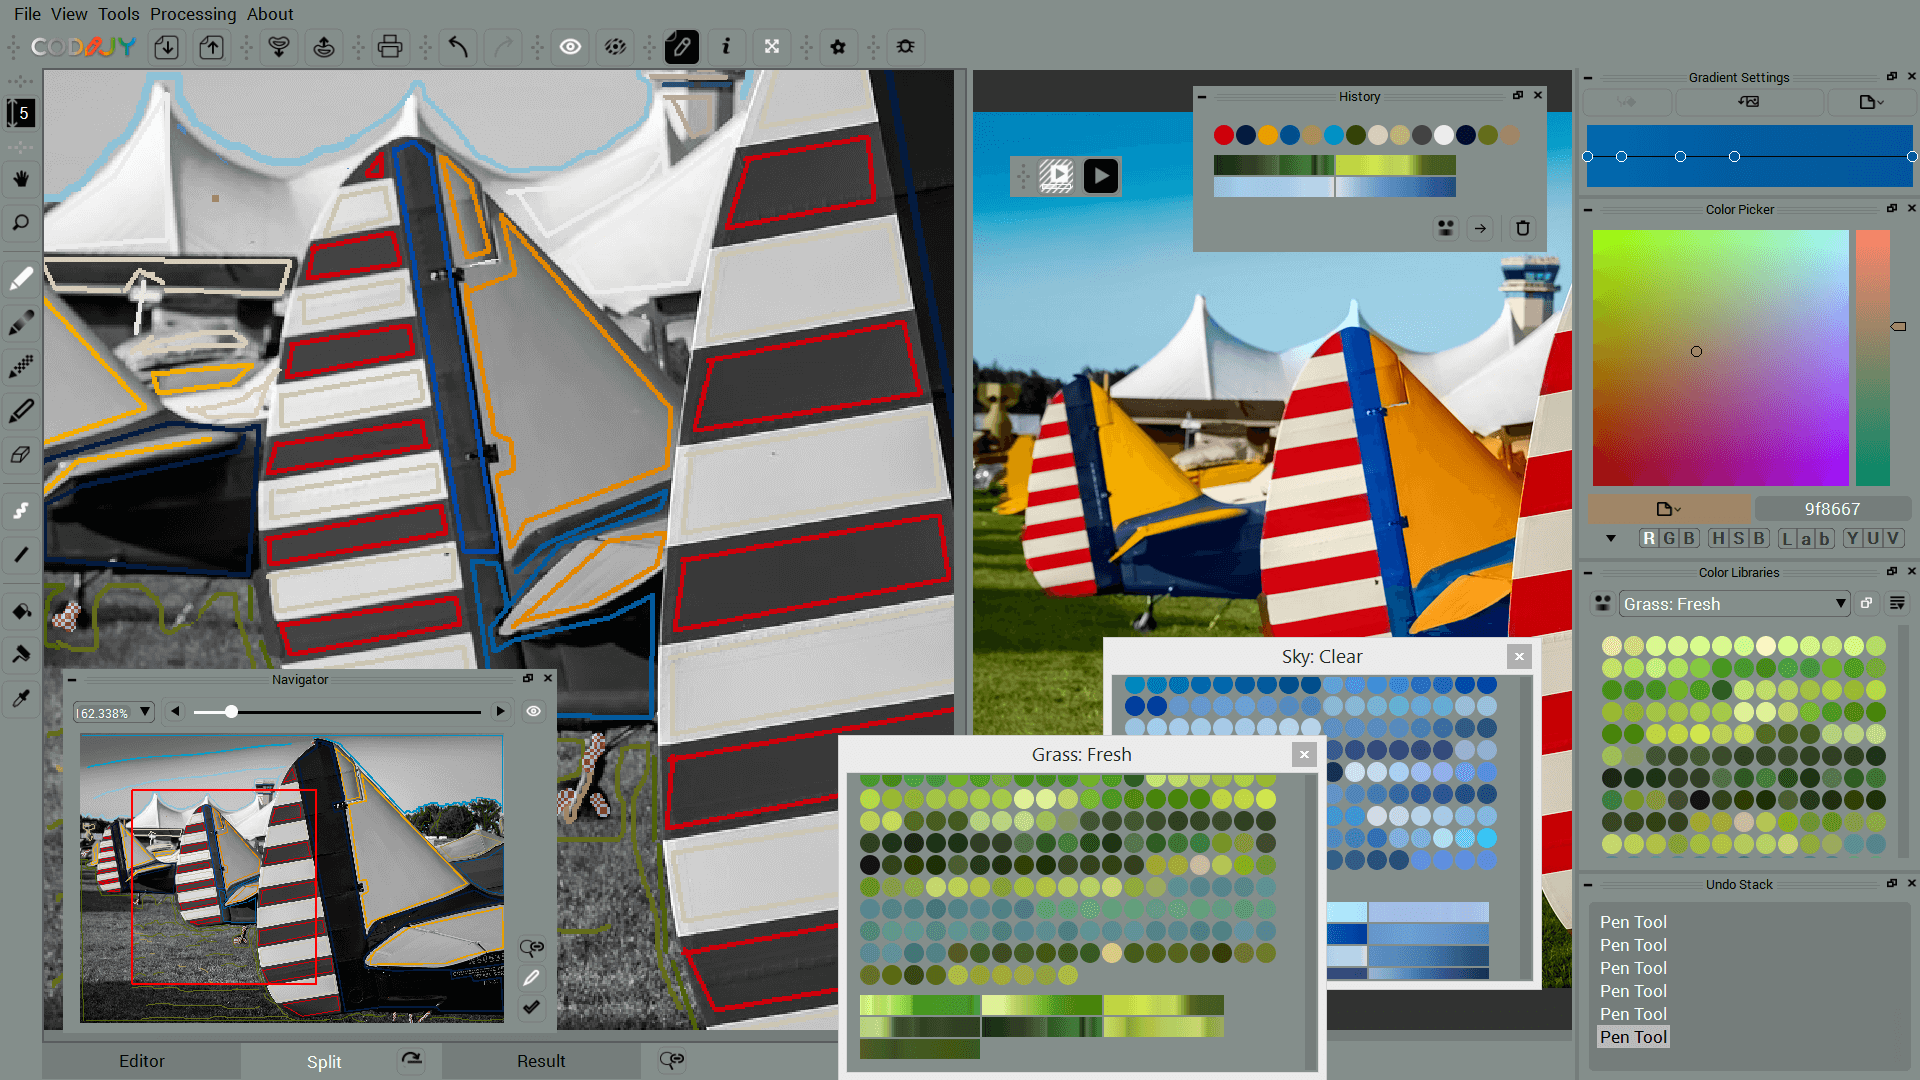 CODIJY workspace with dock windows